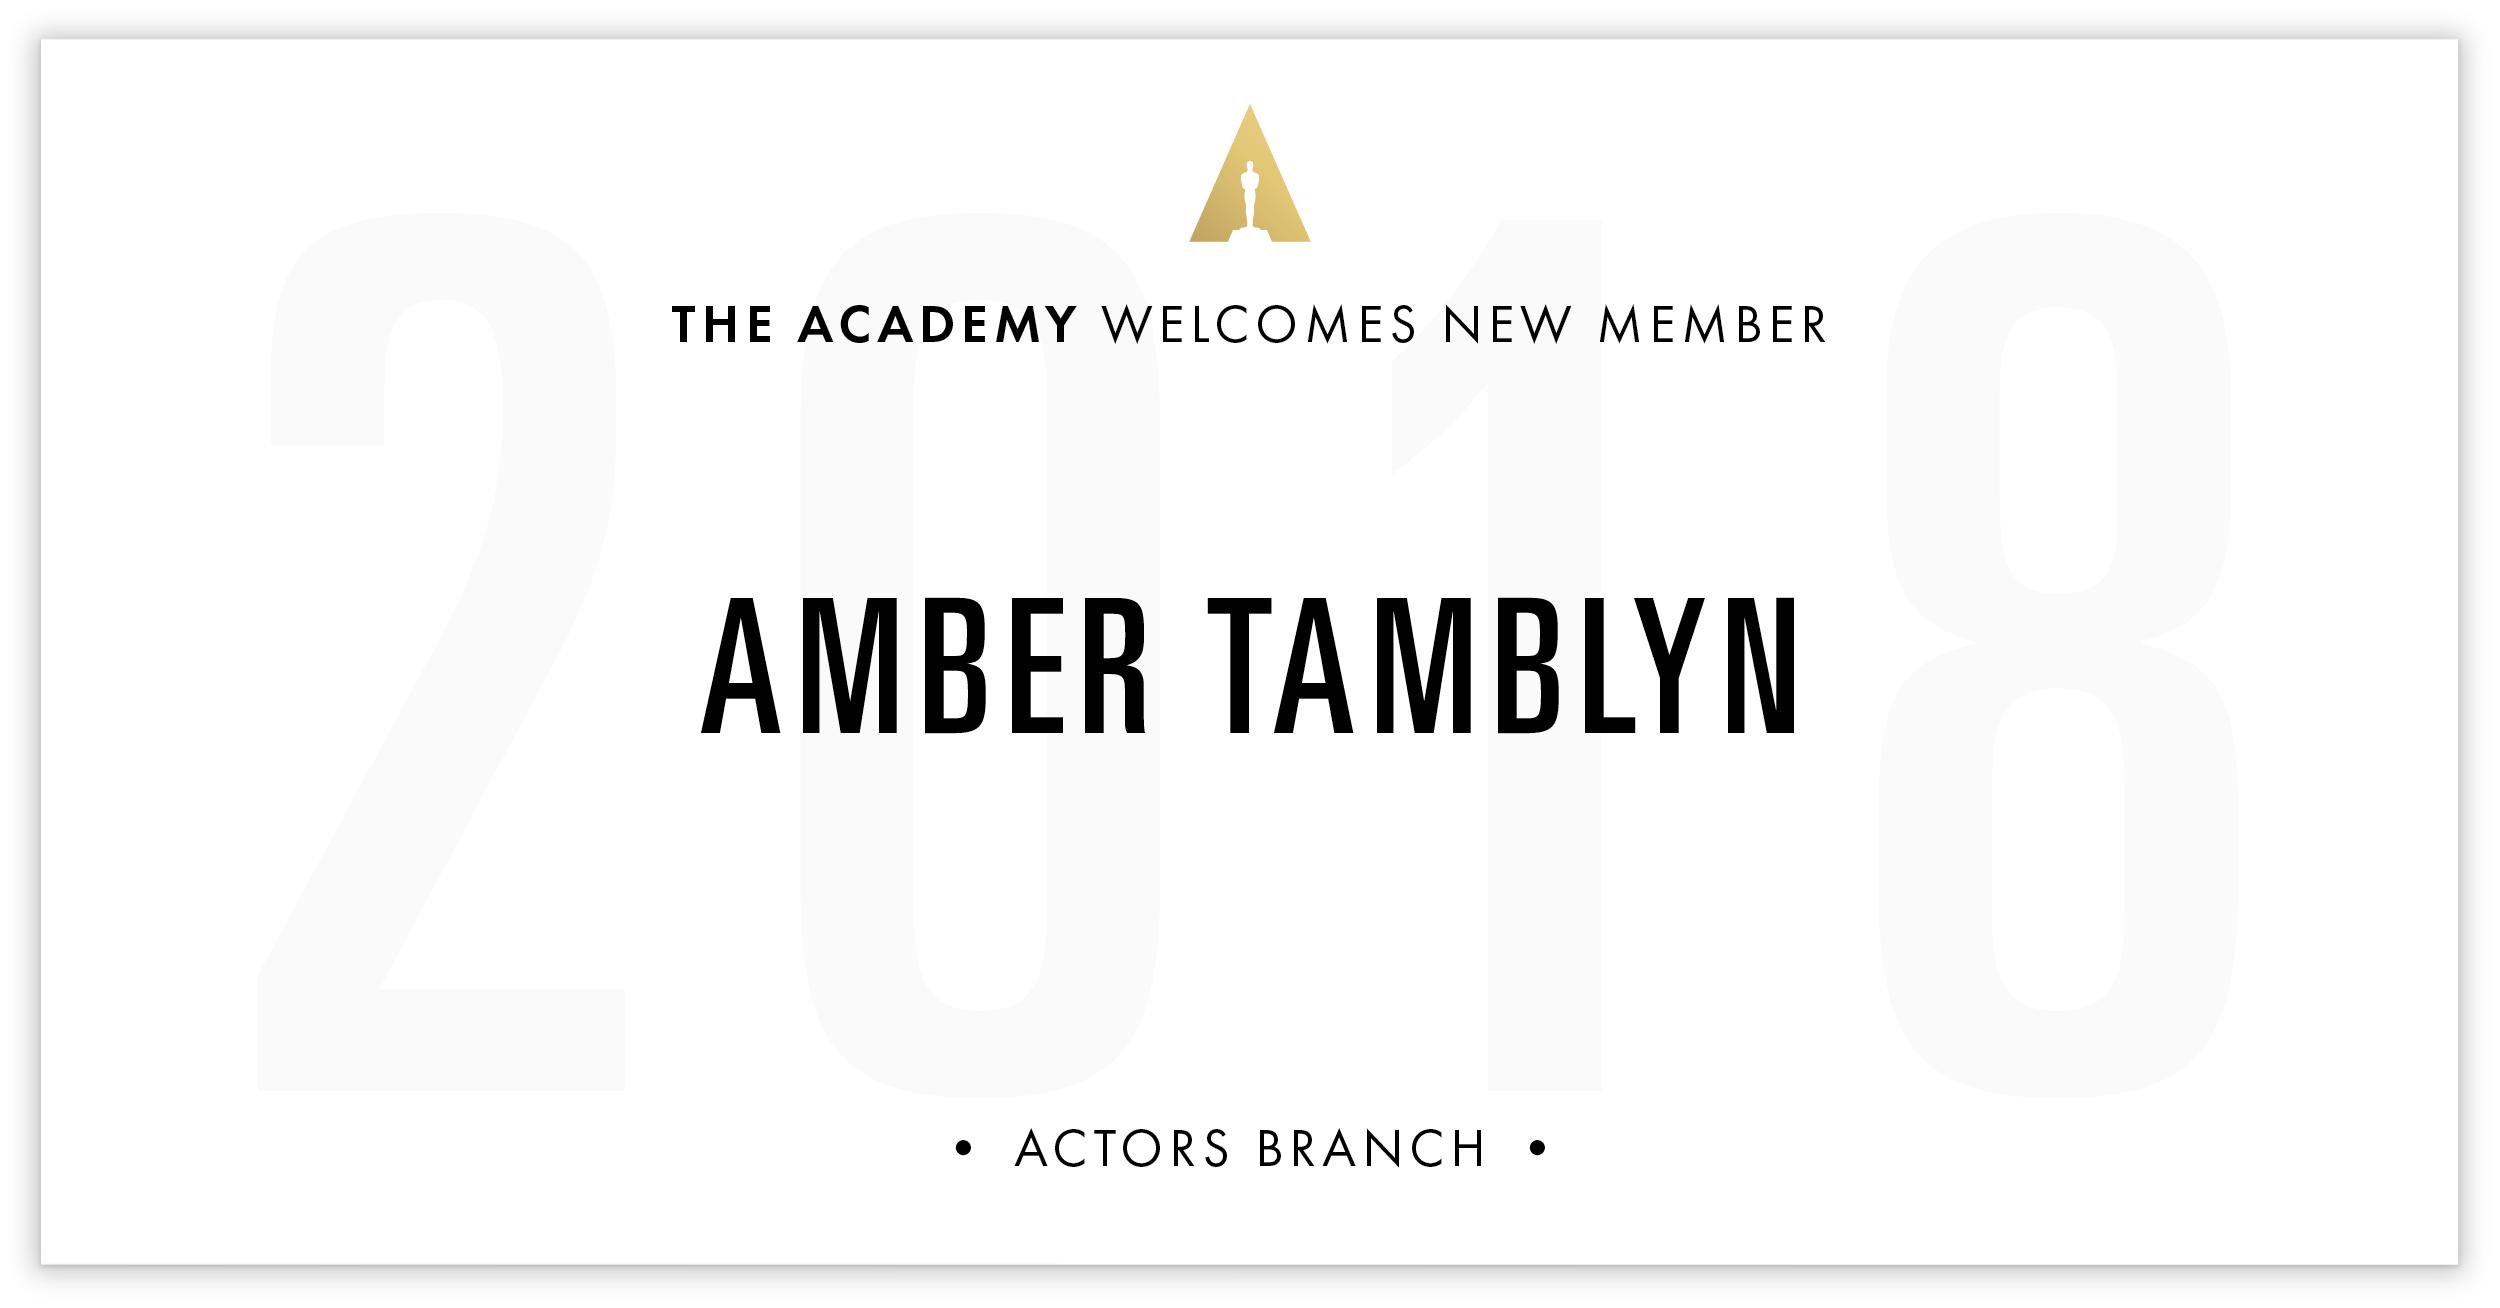 Amber Tamblyn is invited!